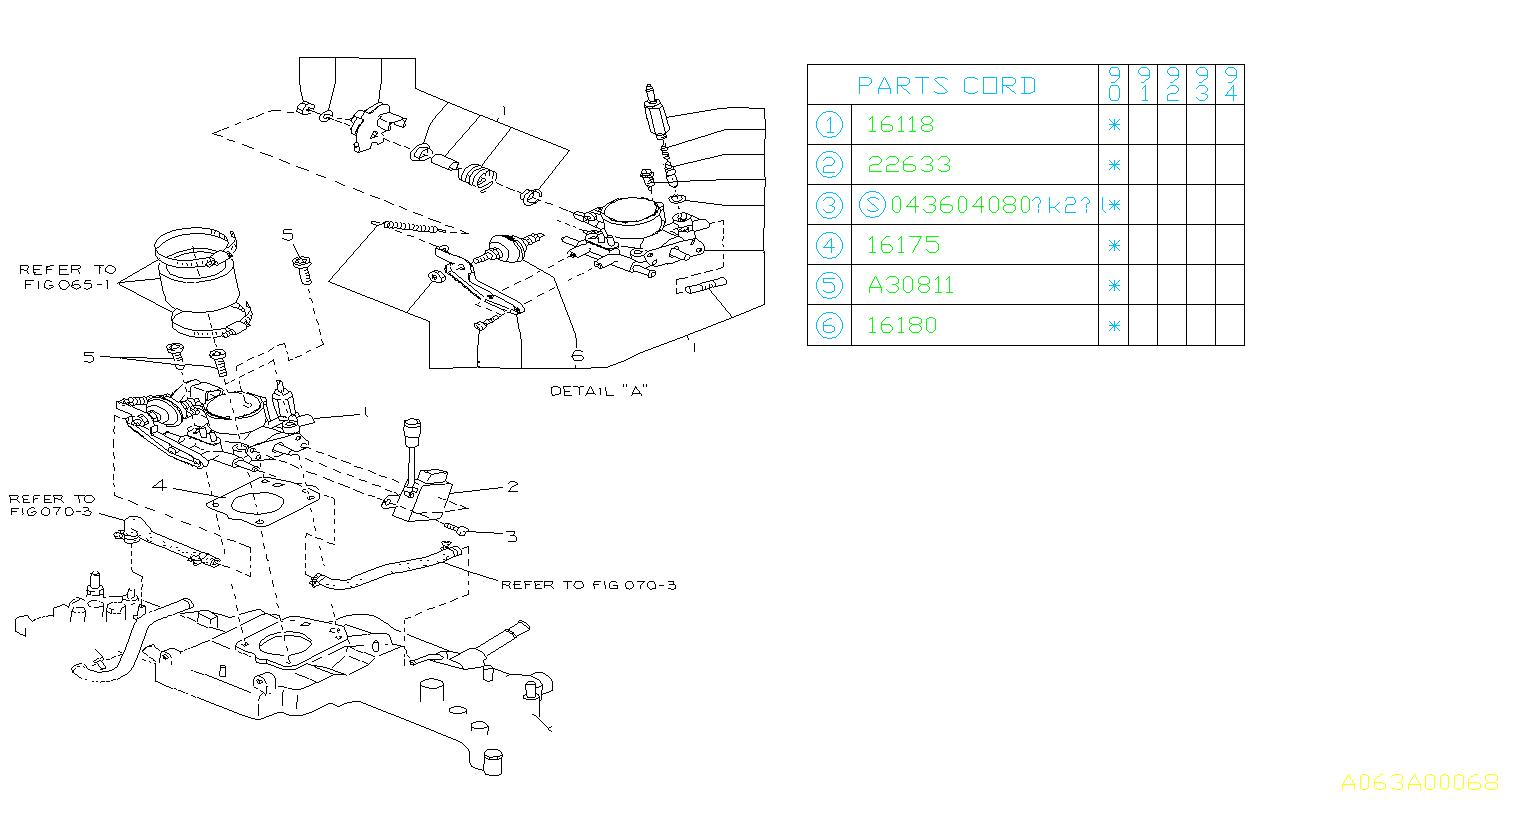 Subaru Loyale Sensor Assembly